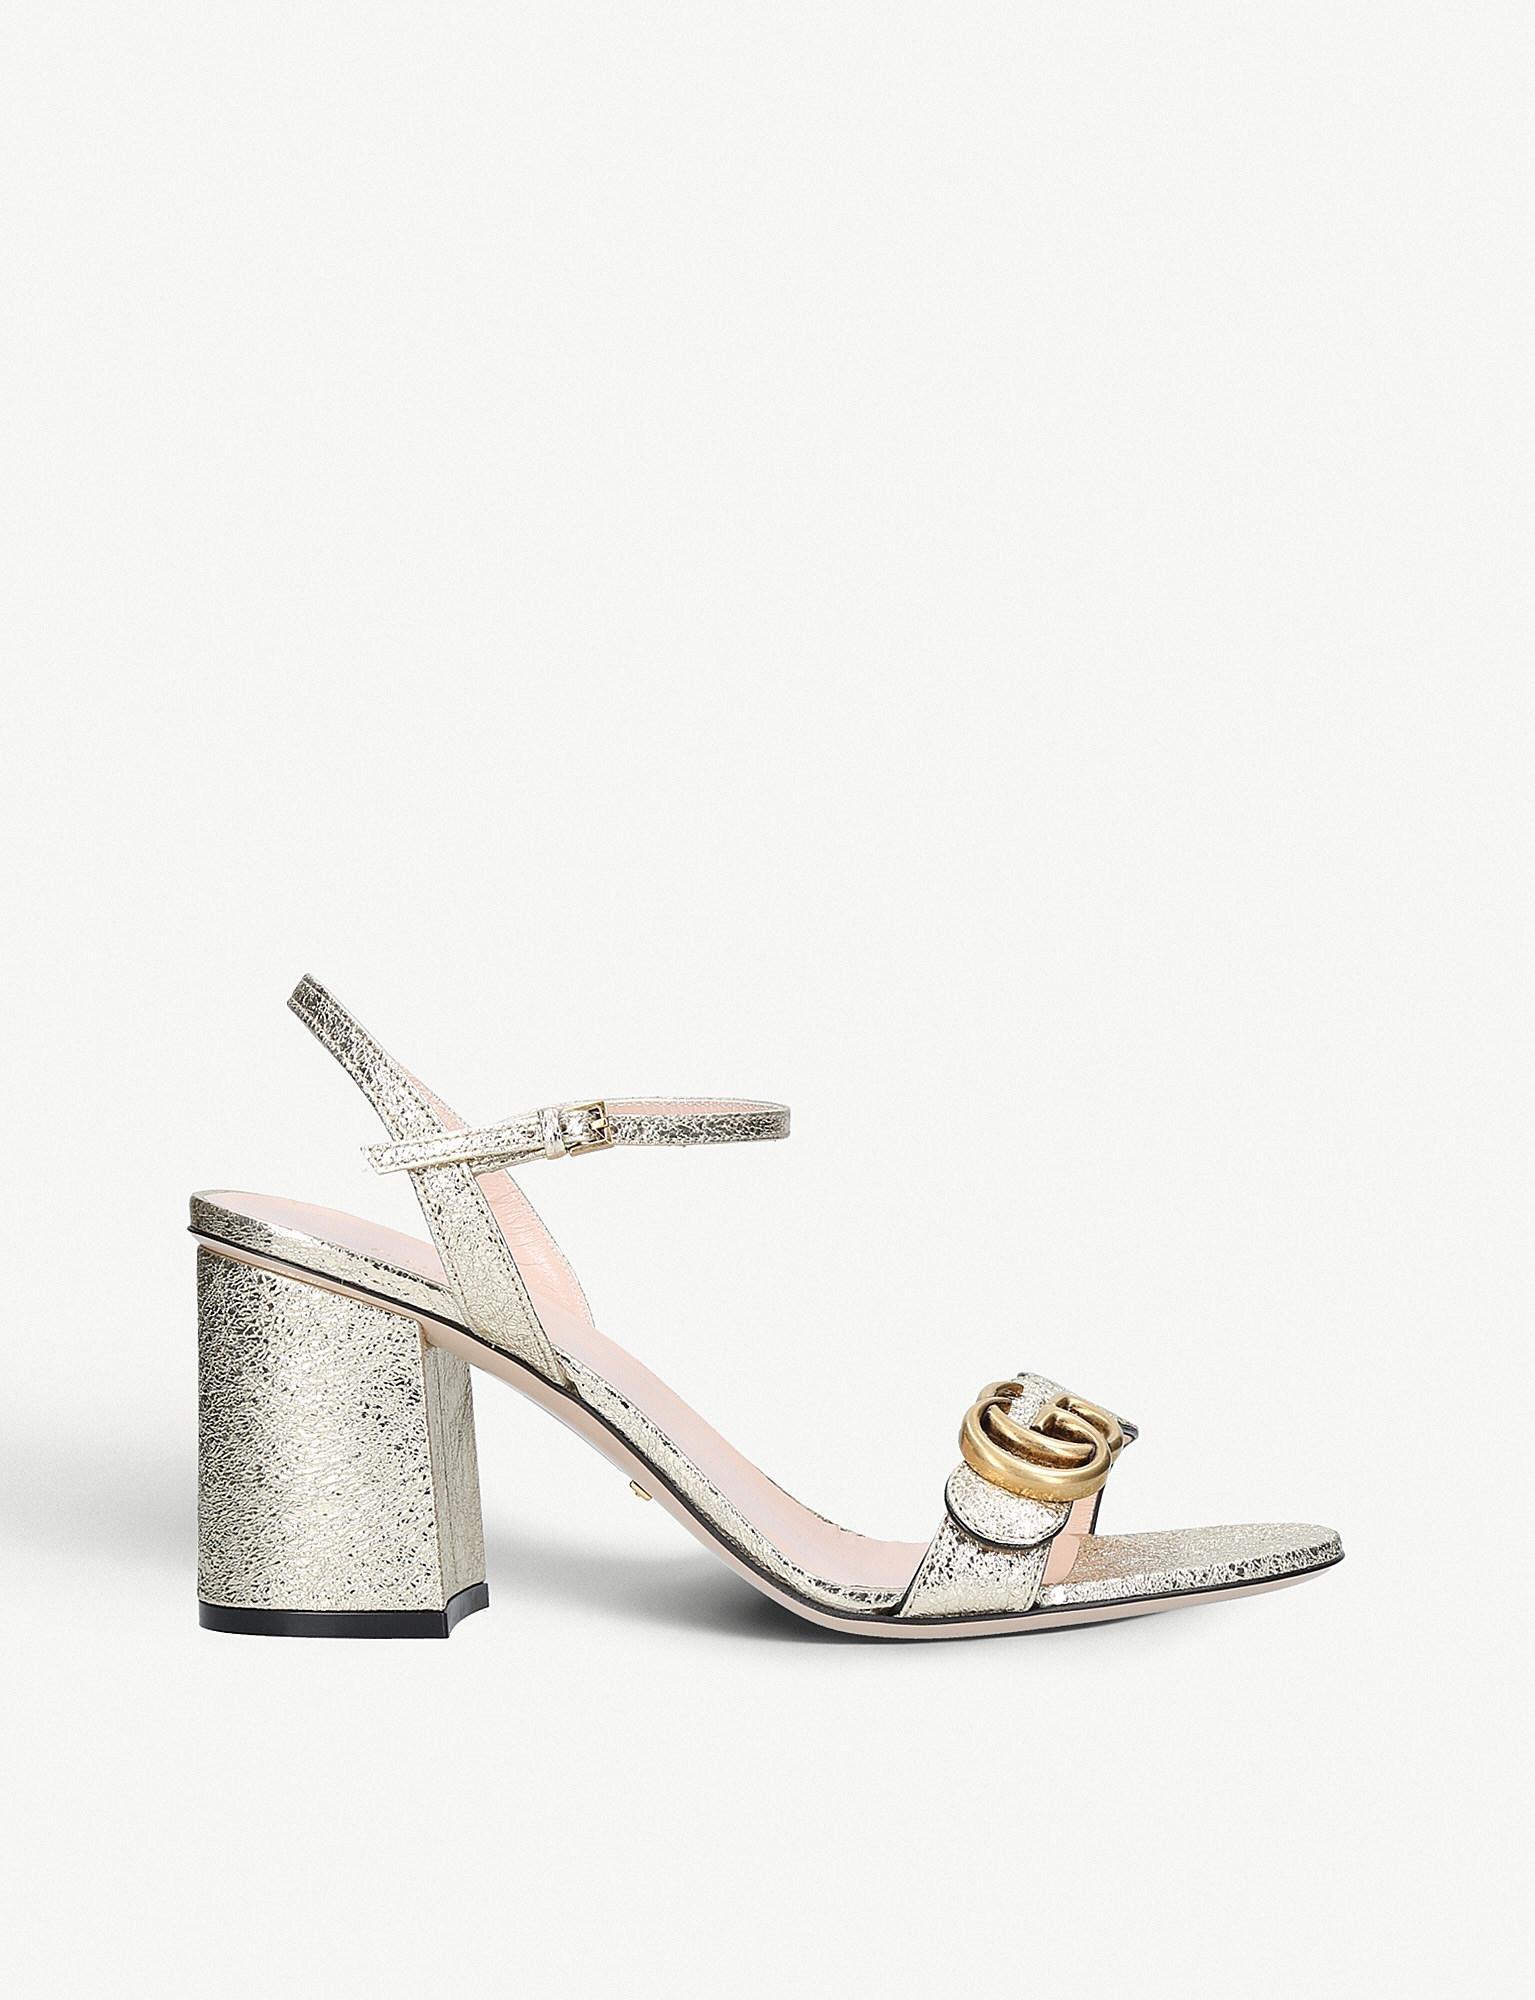 6cbc52eea80f Lyst - Gucci Marmont Metallic Leather Sandals in Metallic